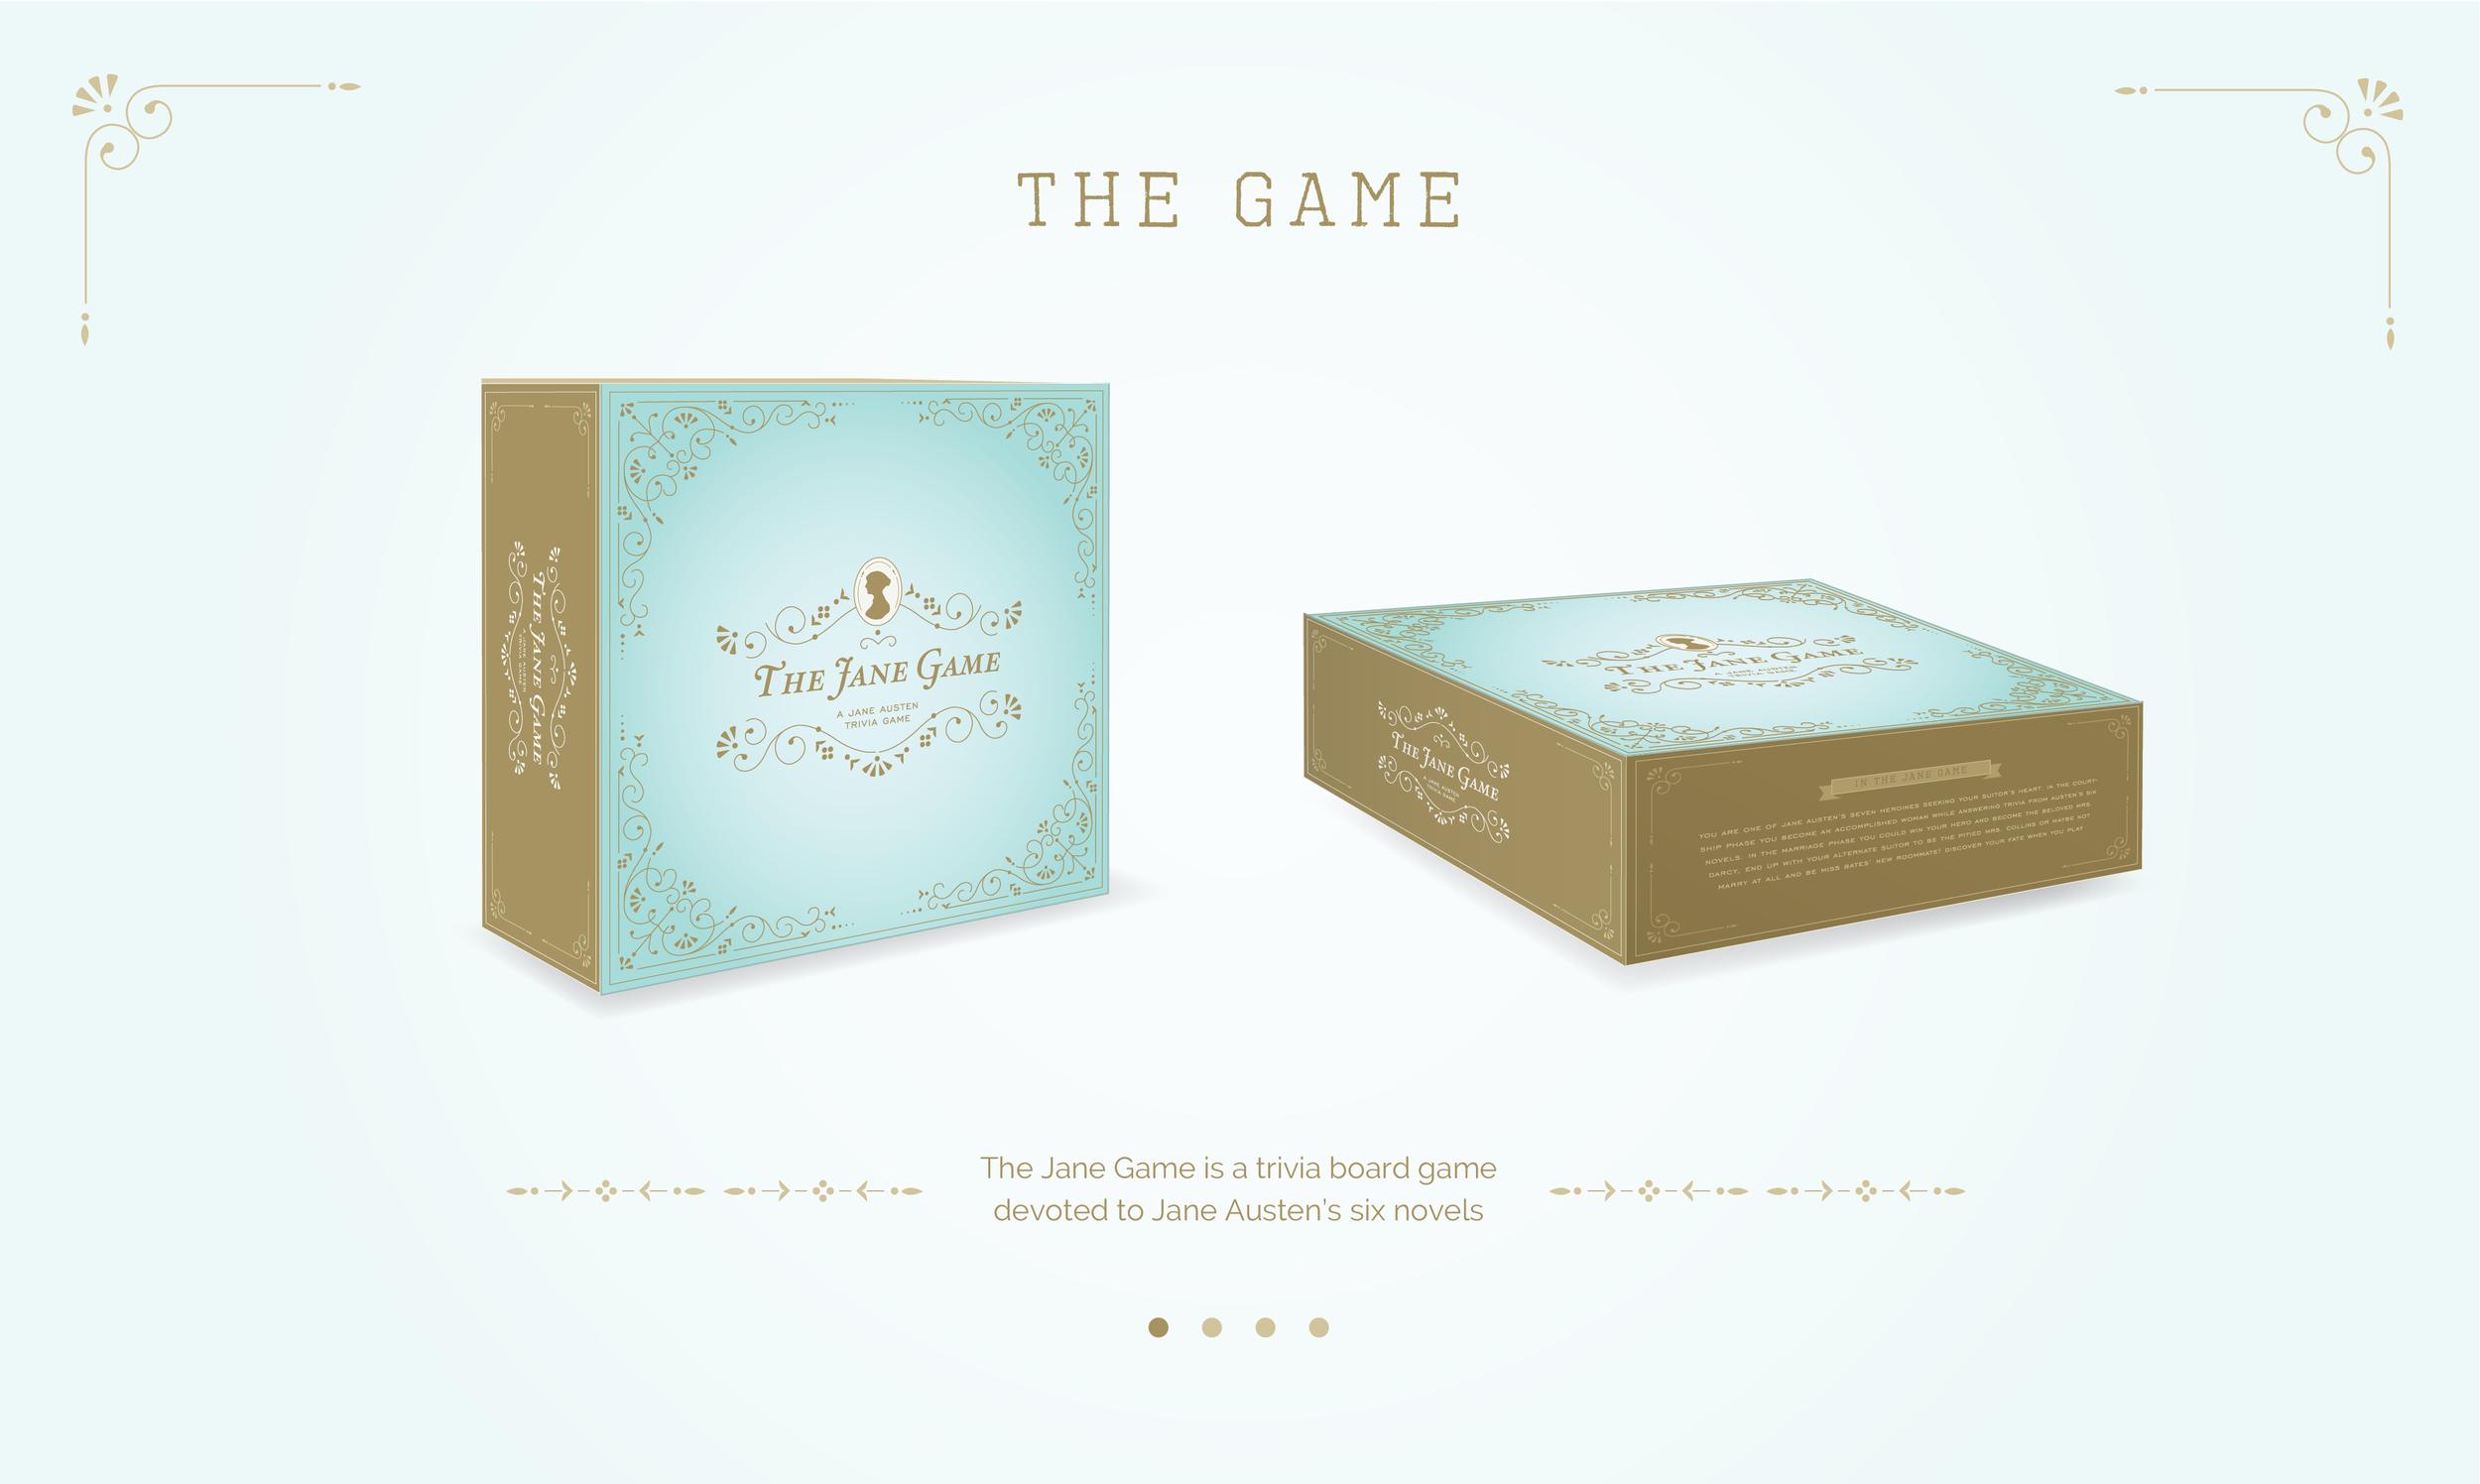 The_Jane_Game_Jane_Austen_Game1.1.jpg